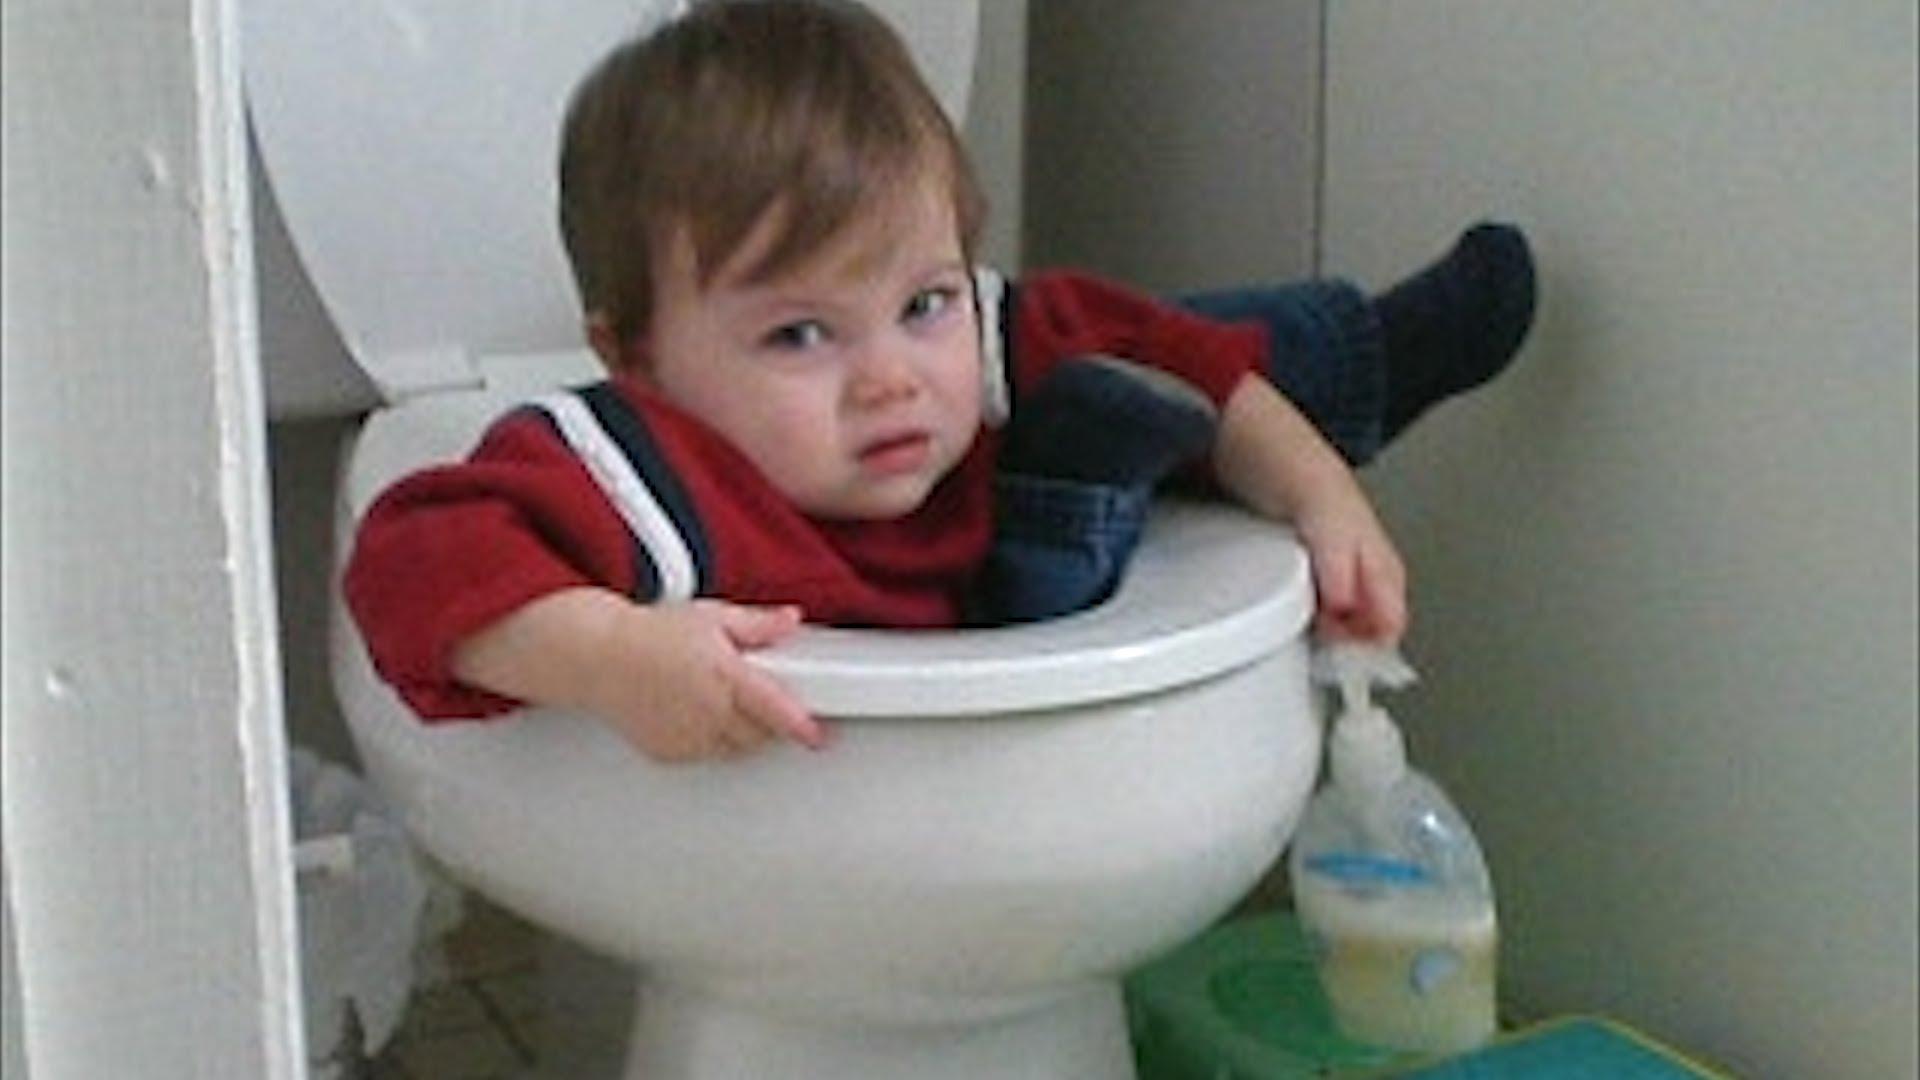 kide stuck